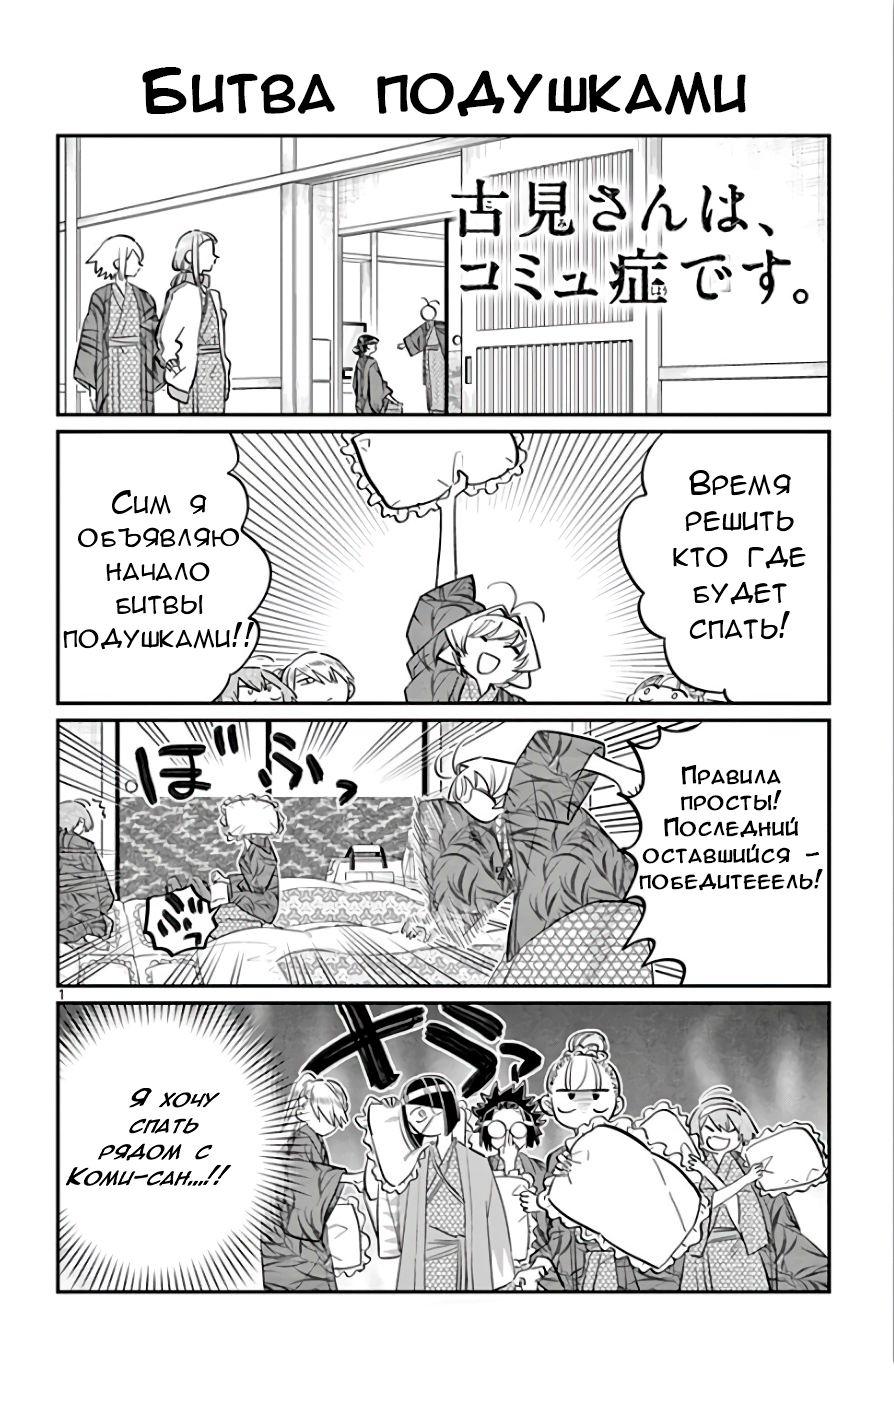 https://r2.ninemanga.com/comics/pic3/12/27788/1287988/1544501772963.jpg Page 1